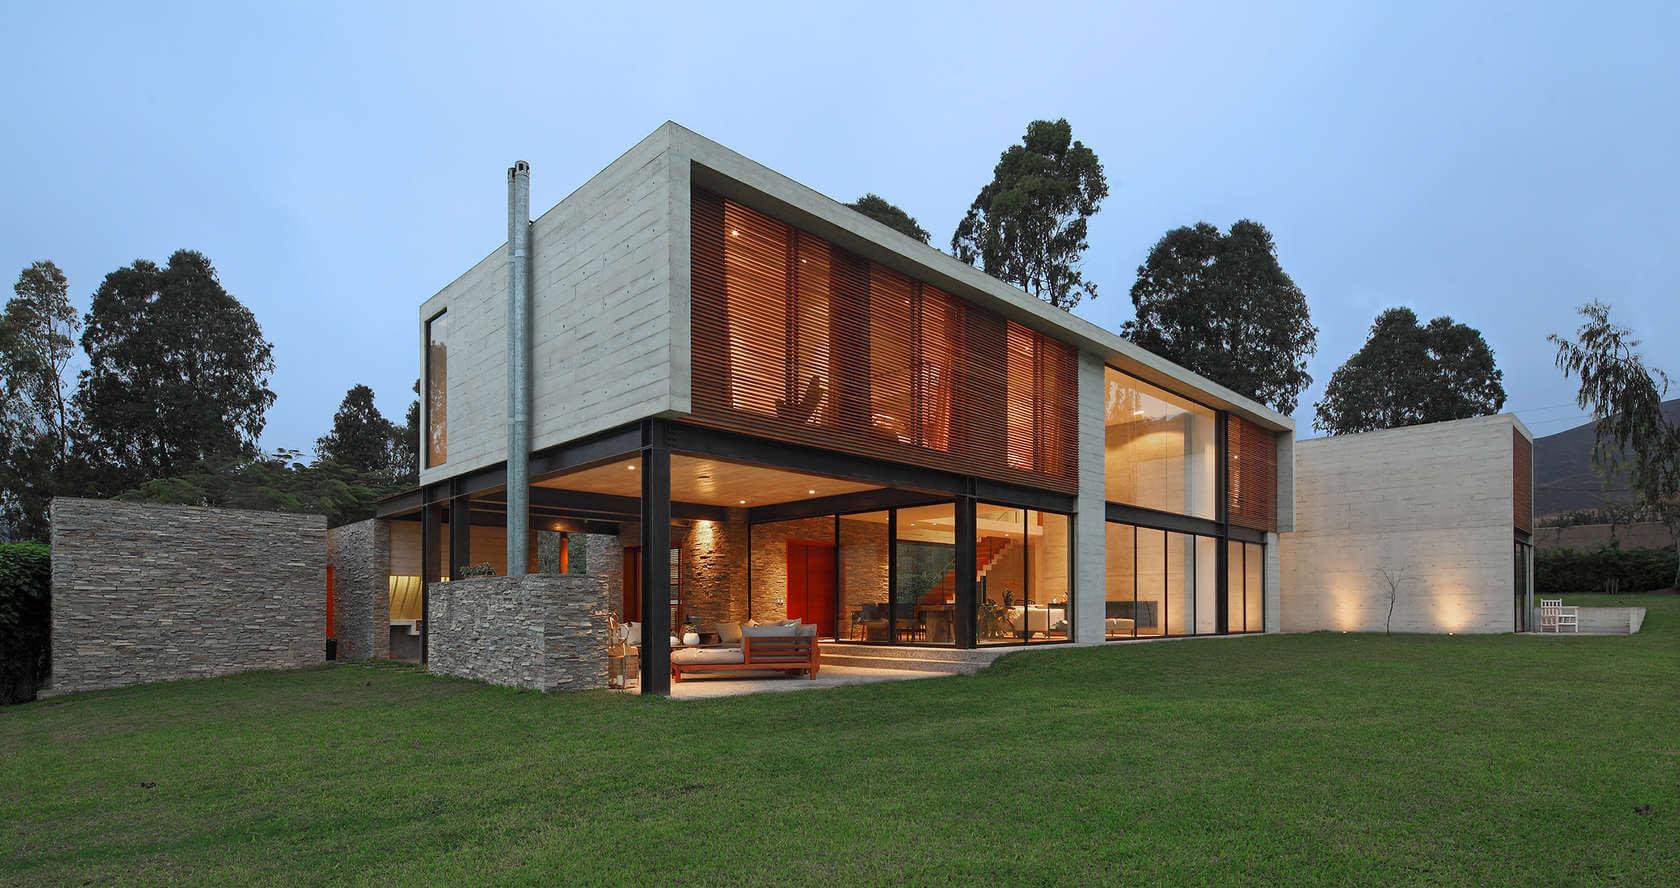 house-b2-jaime-ortiz-de-zevallos-02